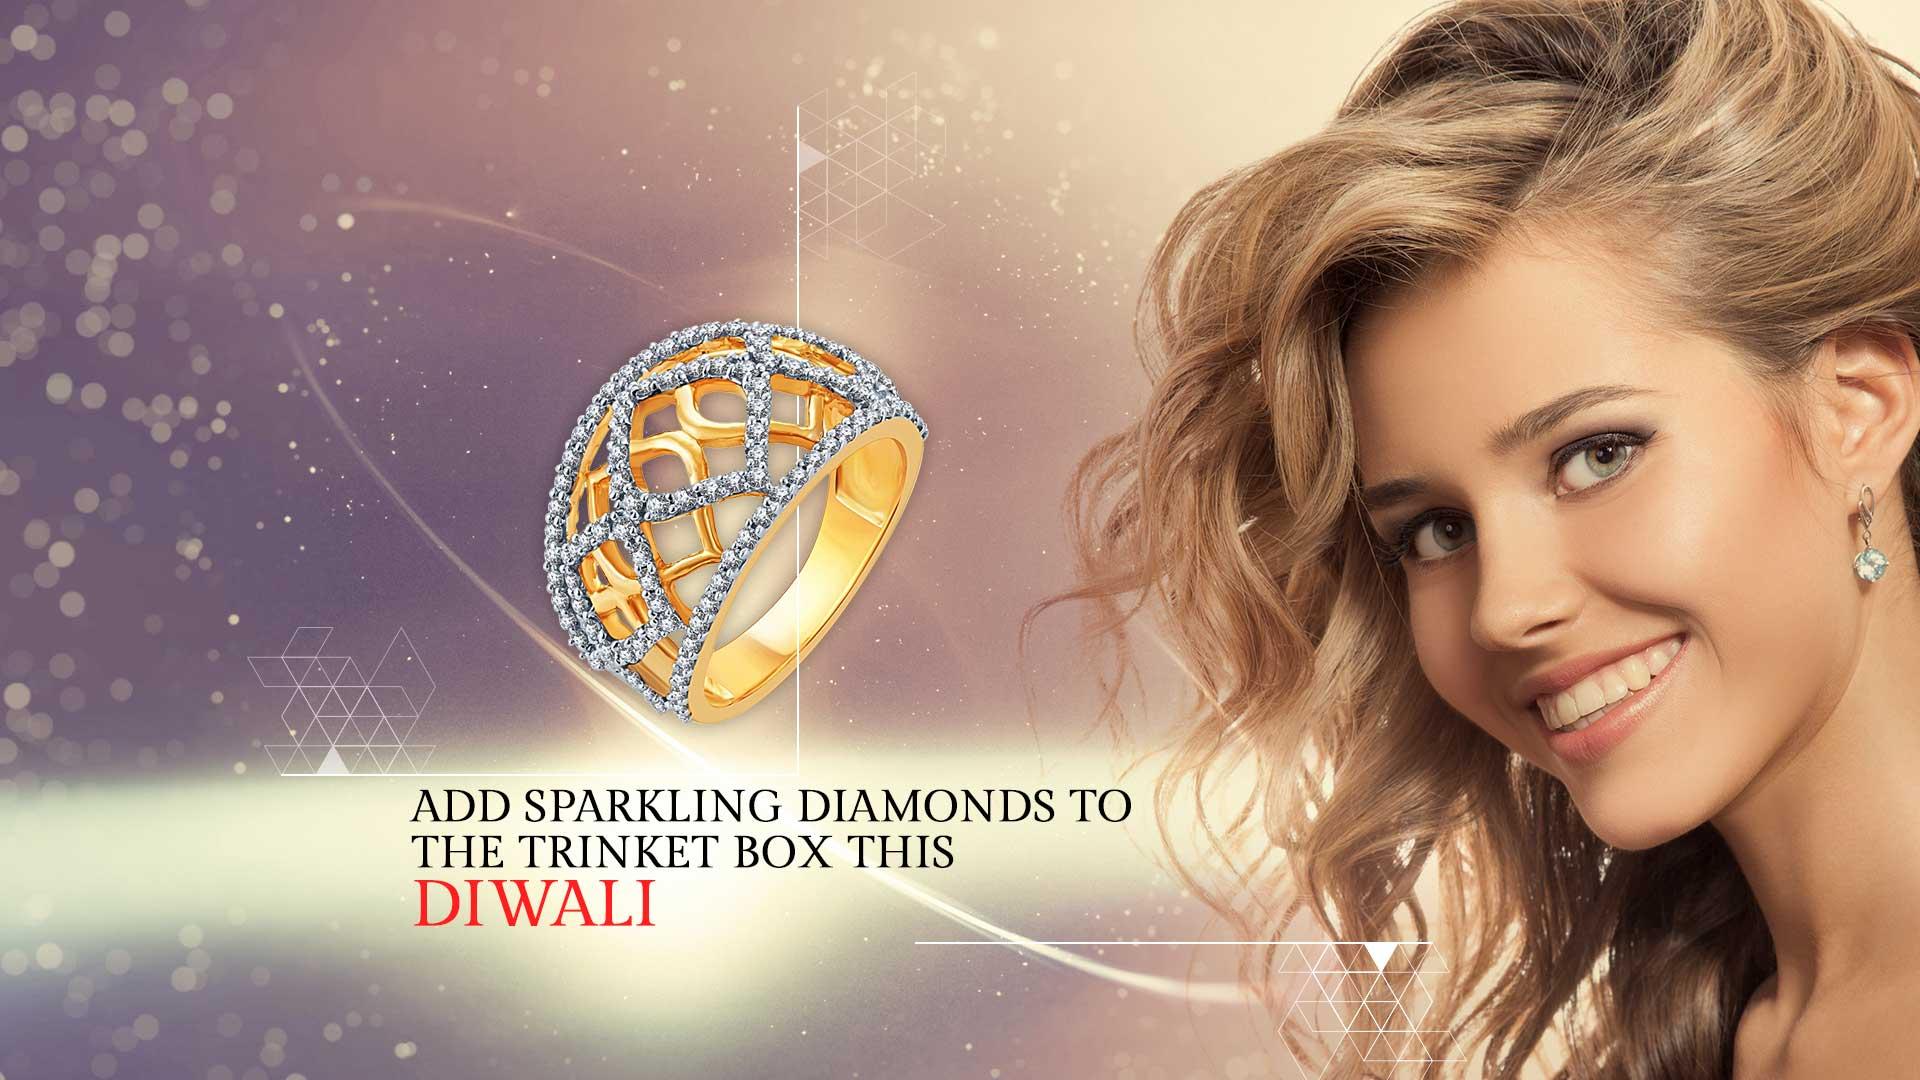 Add Sparkling Diamonds To The Trinket Box This Diwali